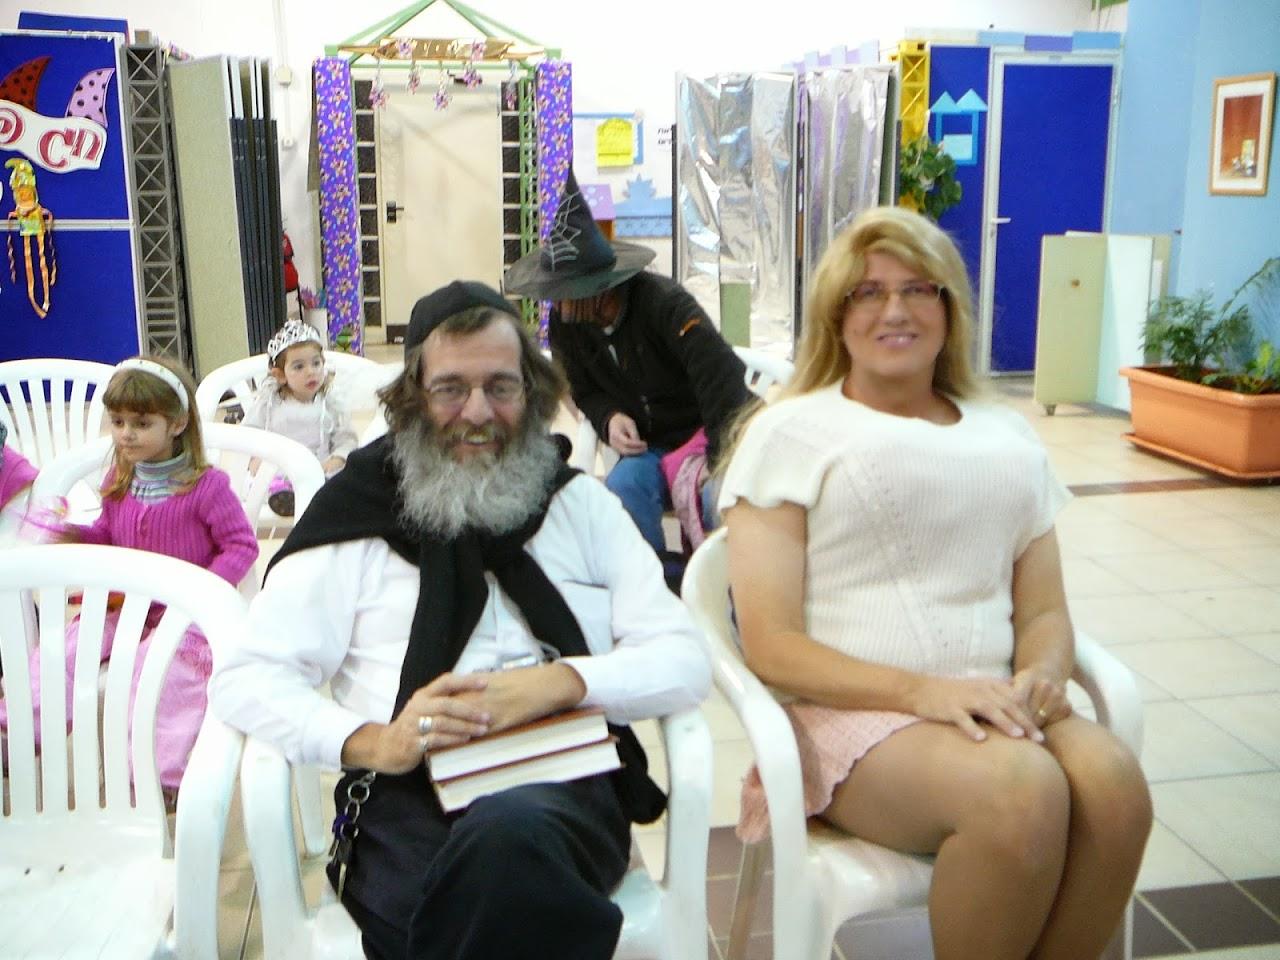 Purim 2007  - 2007-03-03 12.37.55-1.jpg